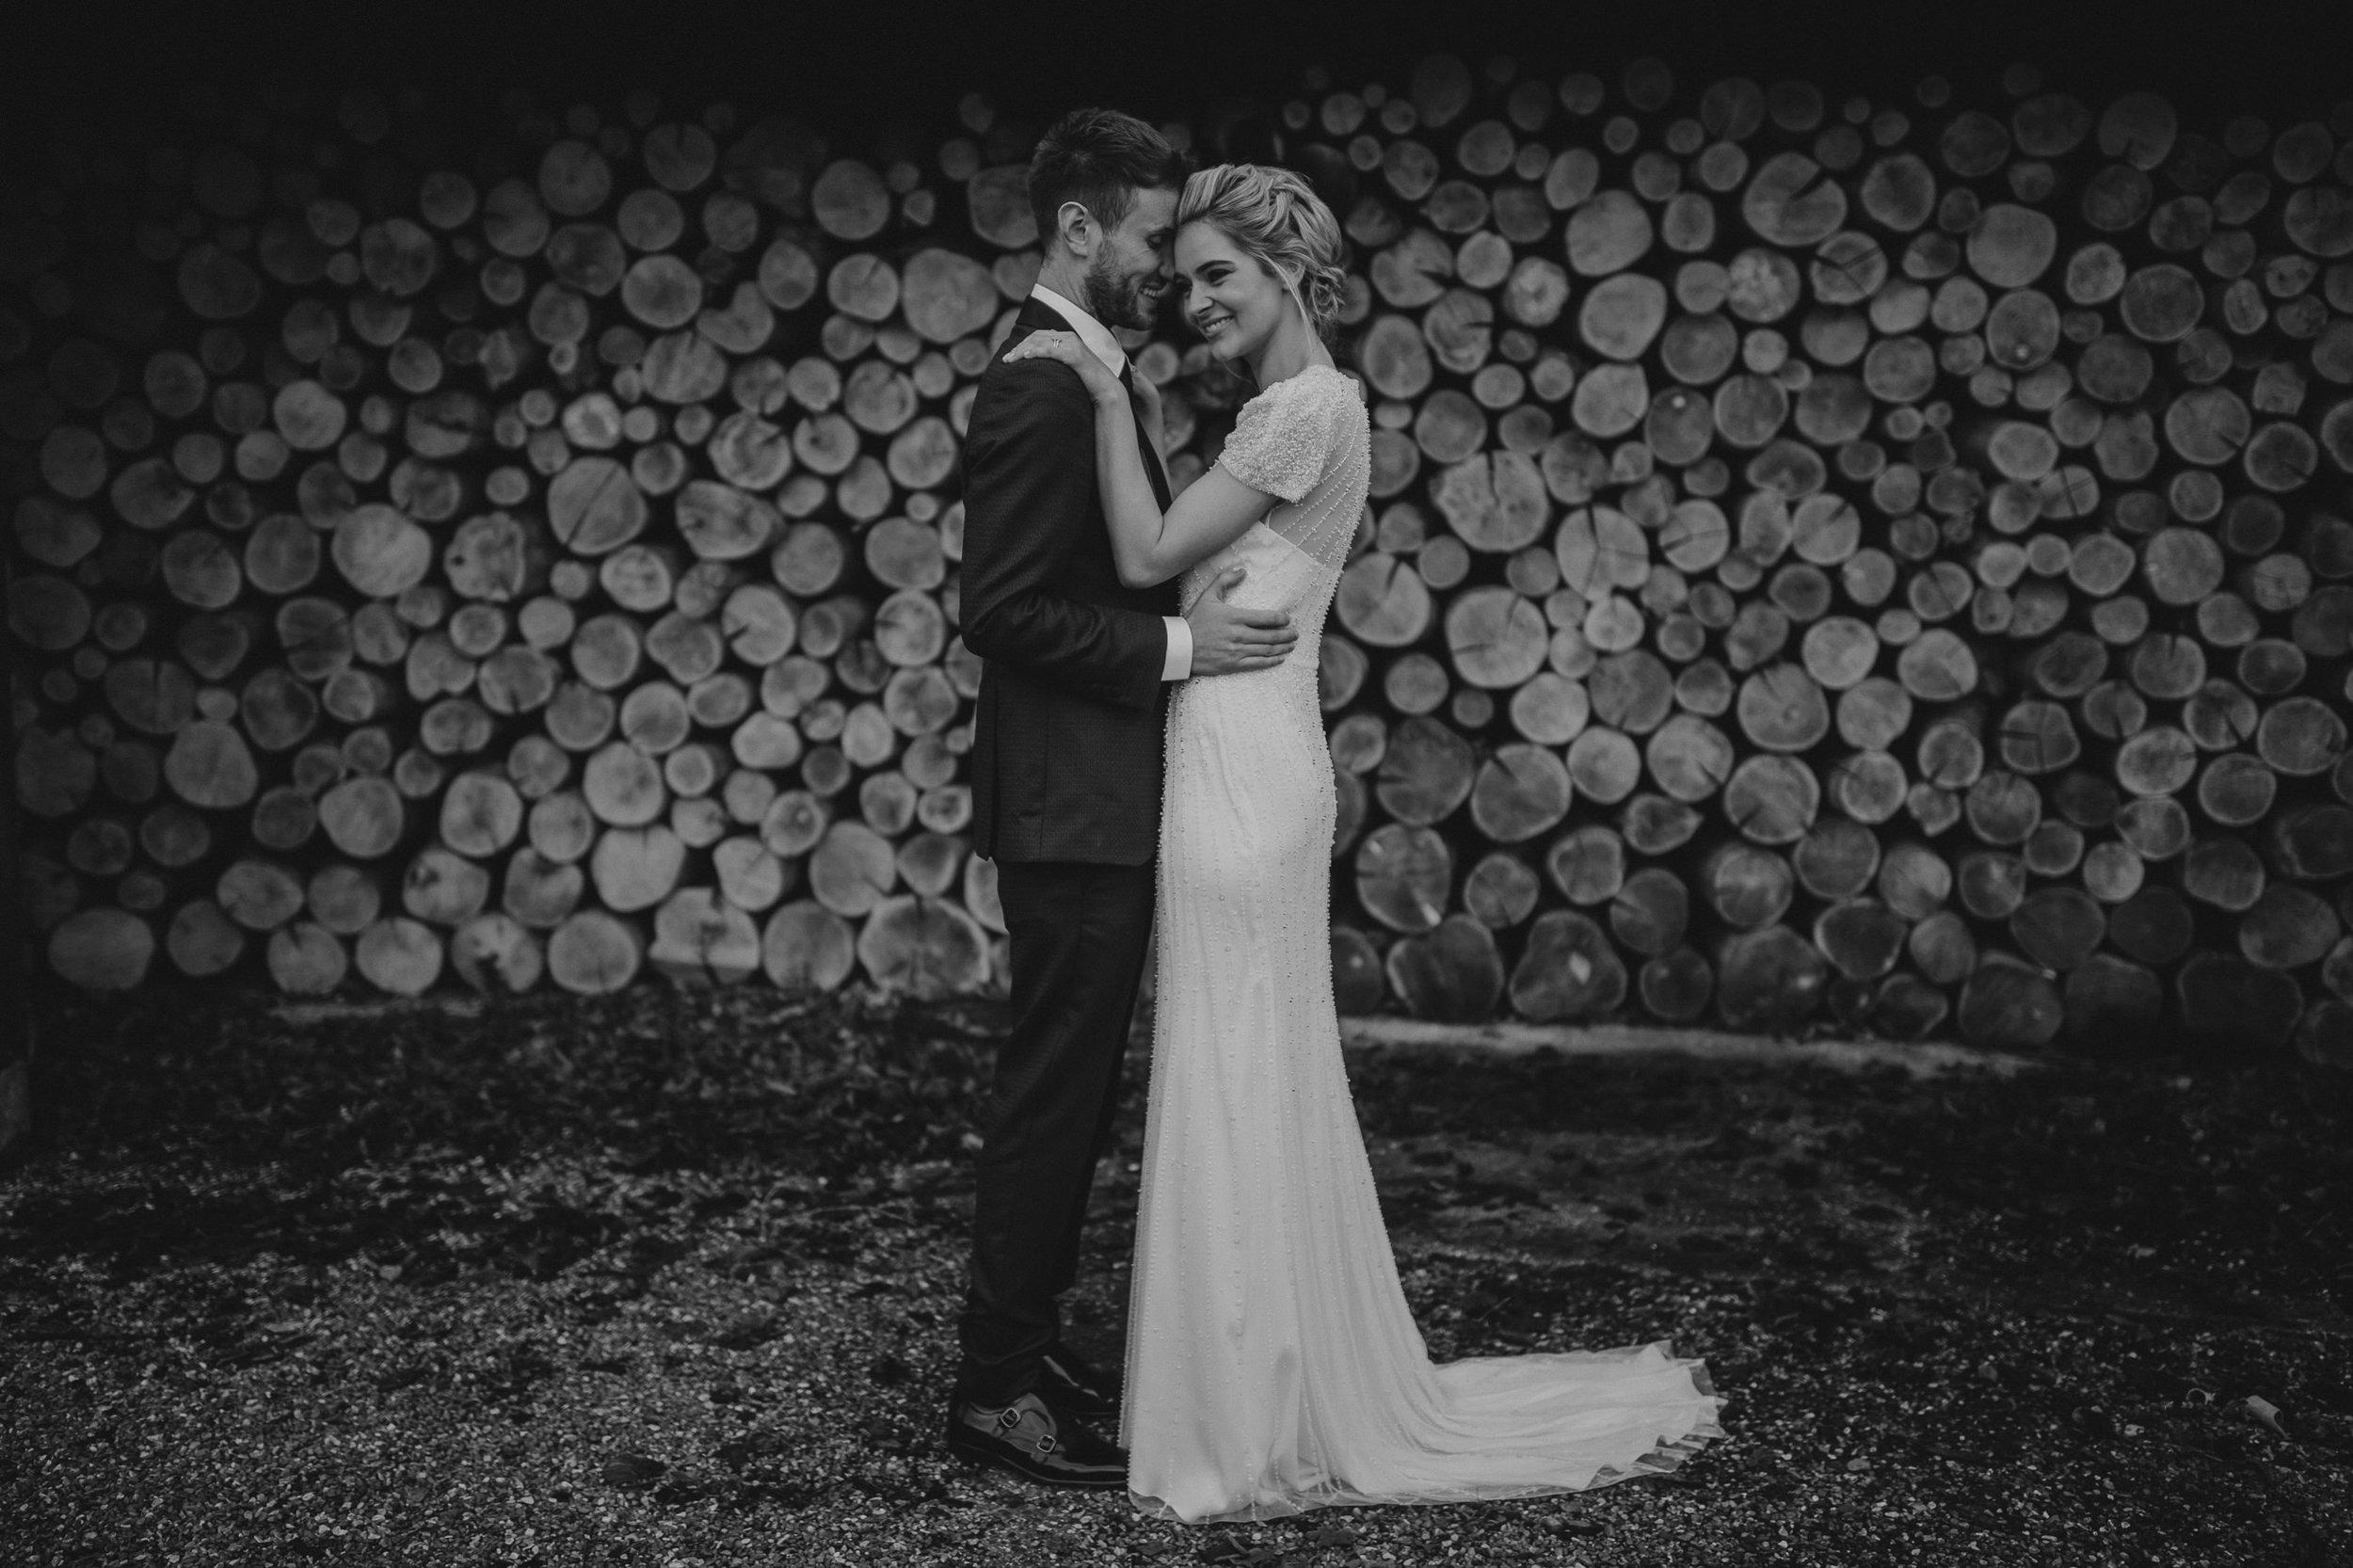 London_wedding_photographer_gione_da_silva_carelle_paul175.jpg